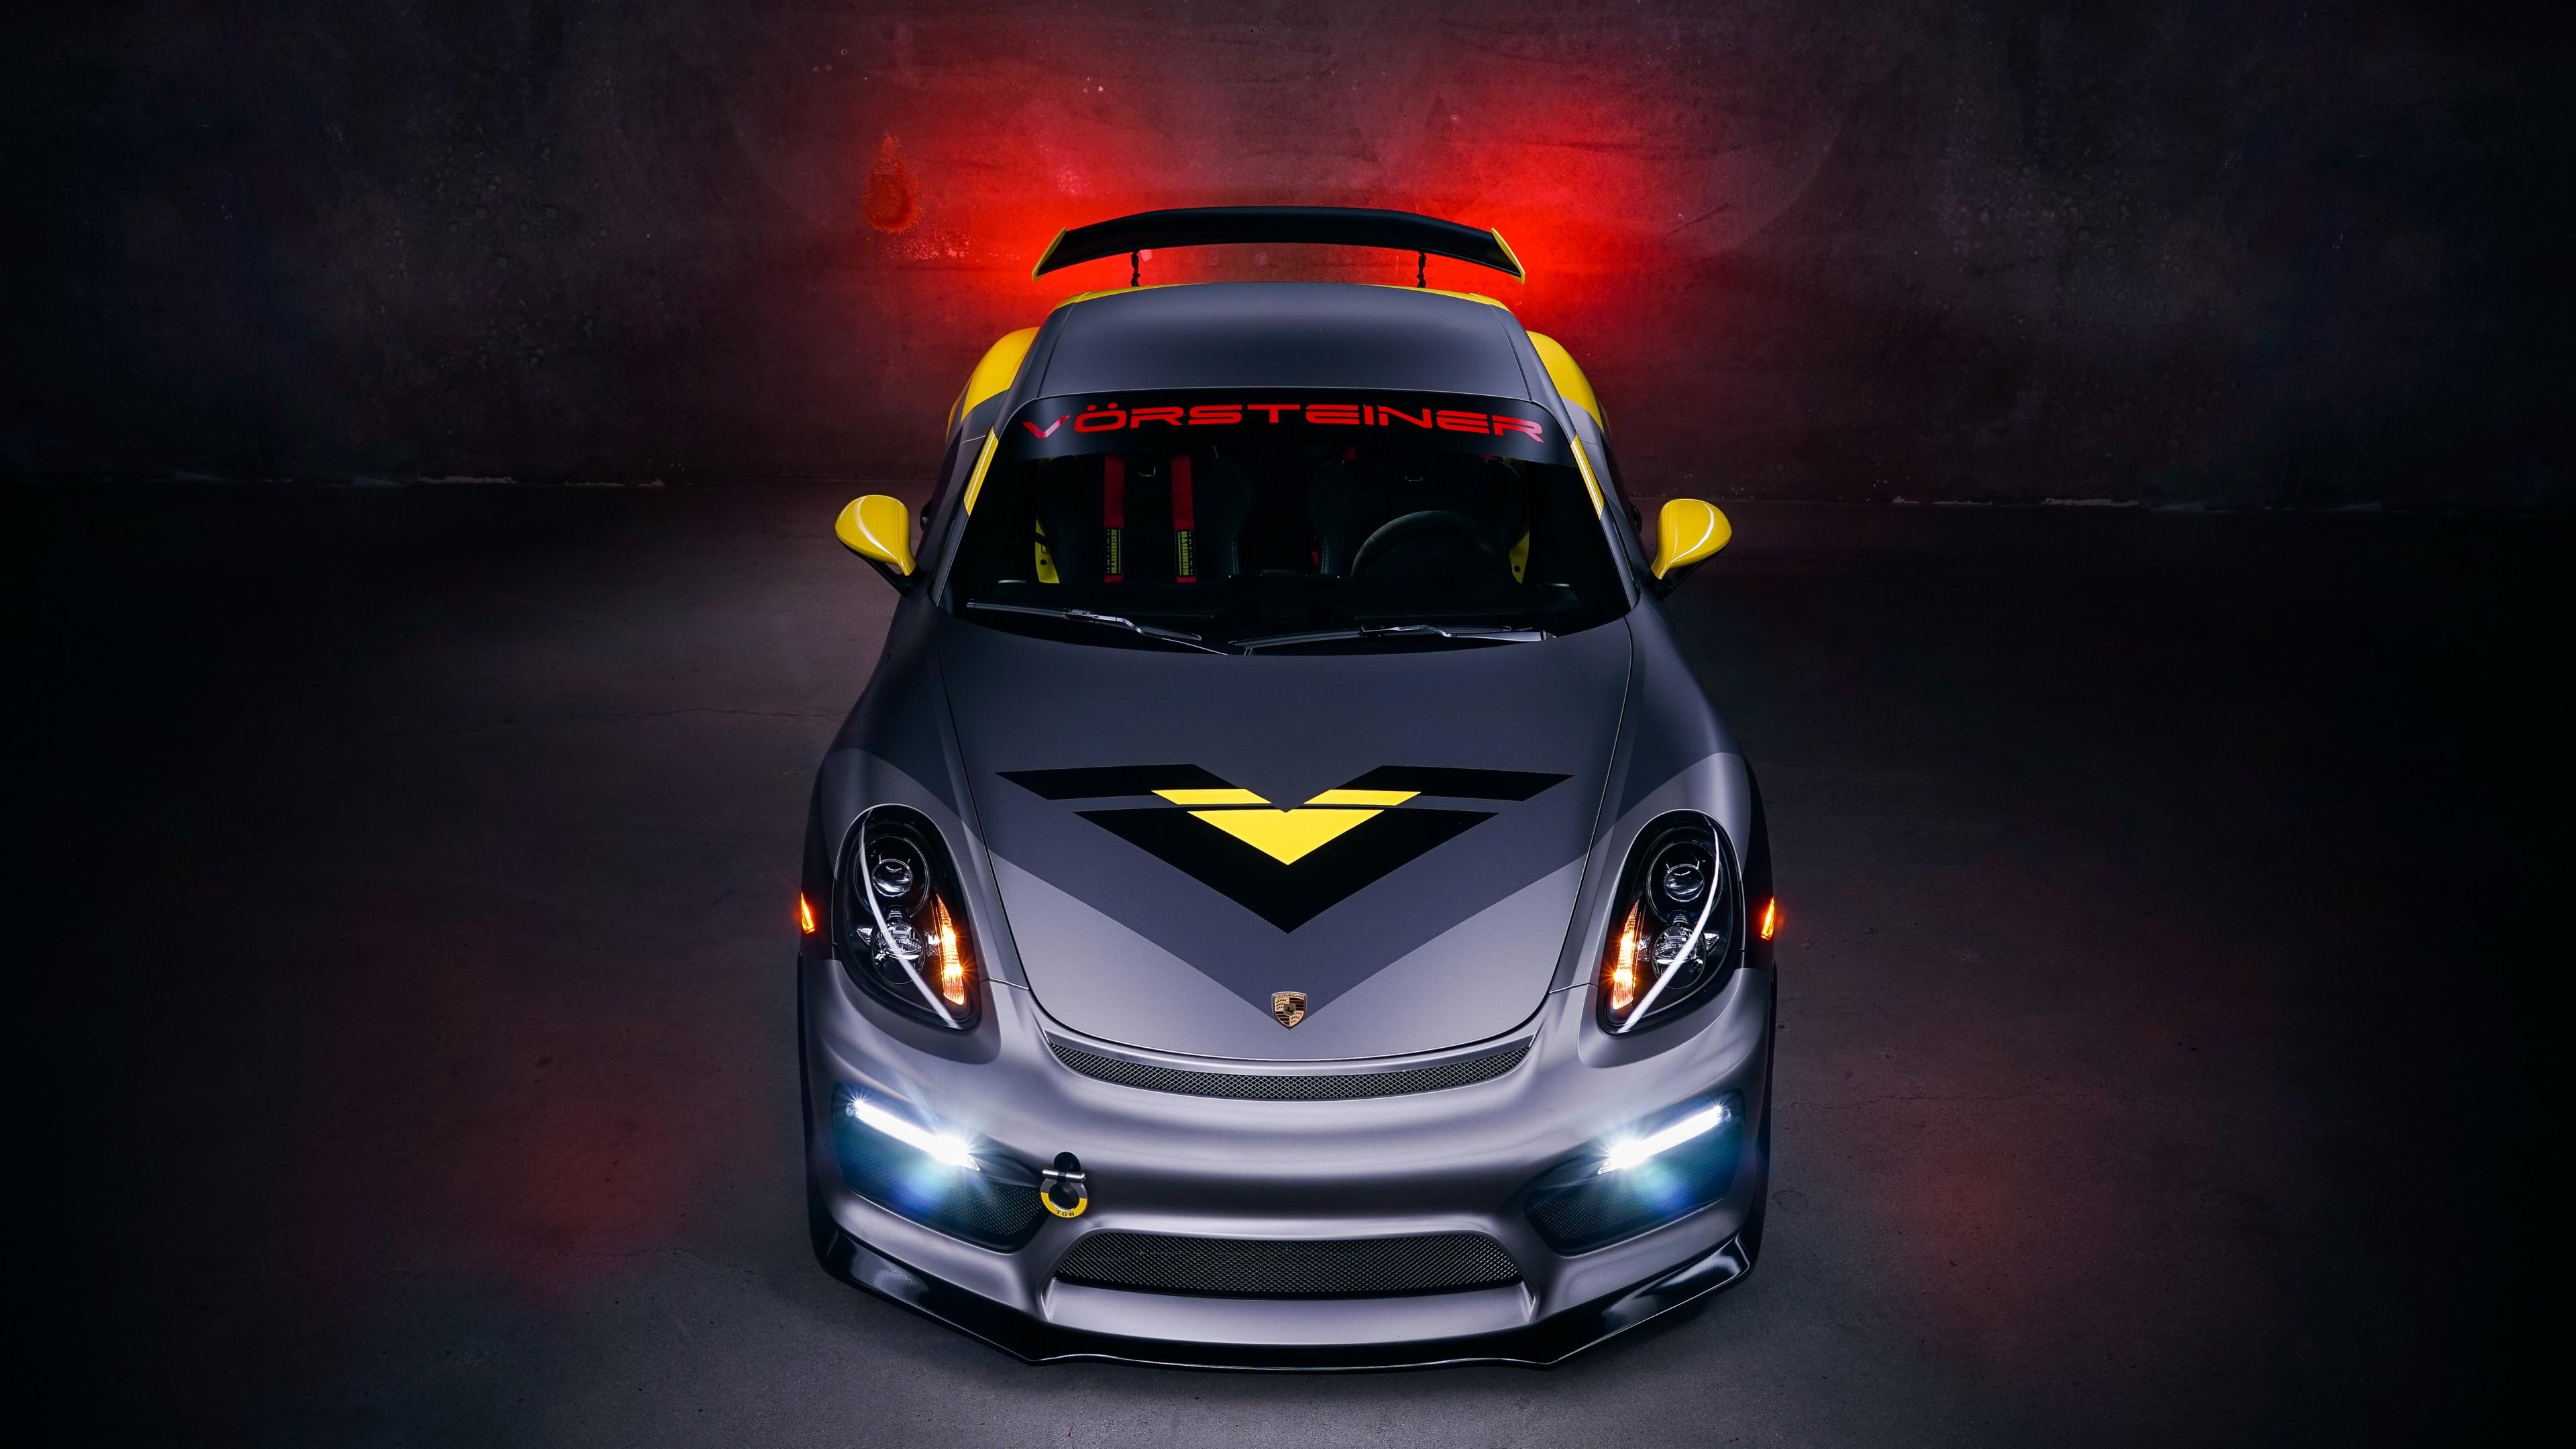 Porsche Macan Wallpaper Iphone Porsche Gt4 Vorsteiner 4k 5k Wallpaper Hd Car Wallpapers